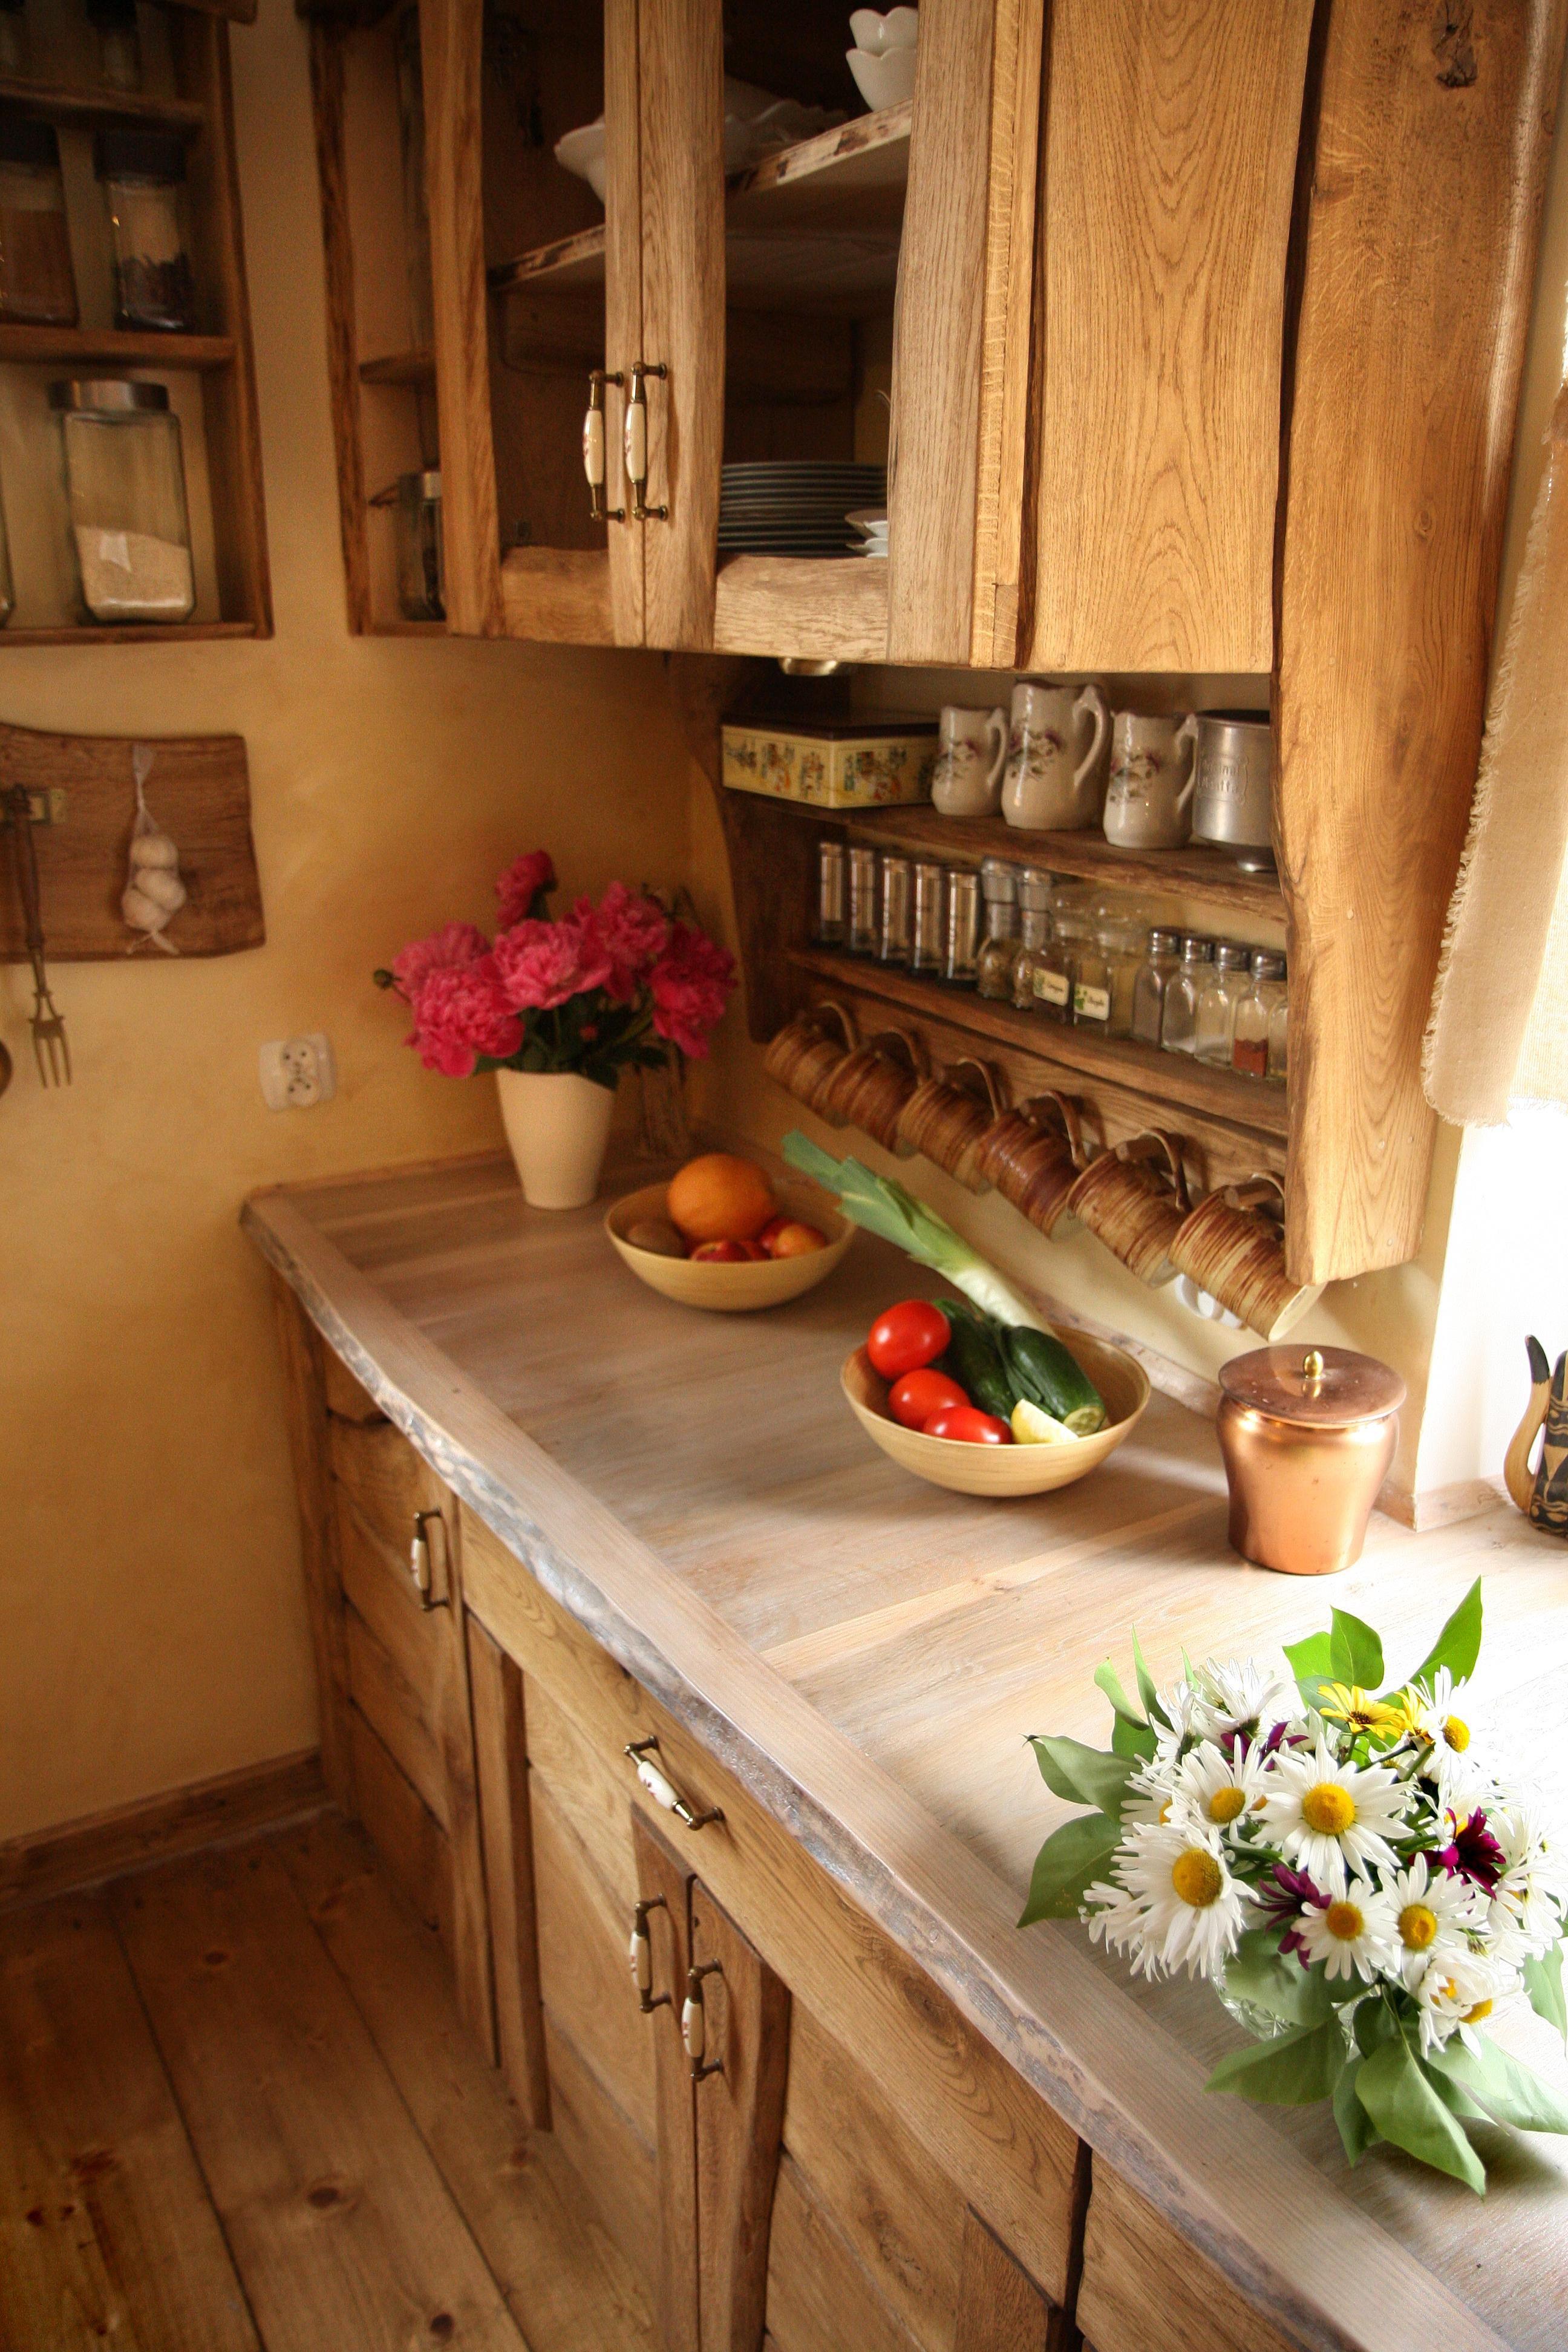 Holzküche | wood kitchen | swiss chalet | Pinterest | Holzküche ... | {Holzküche 23}